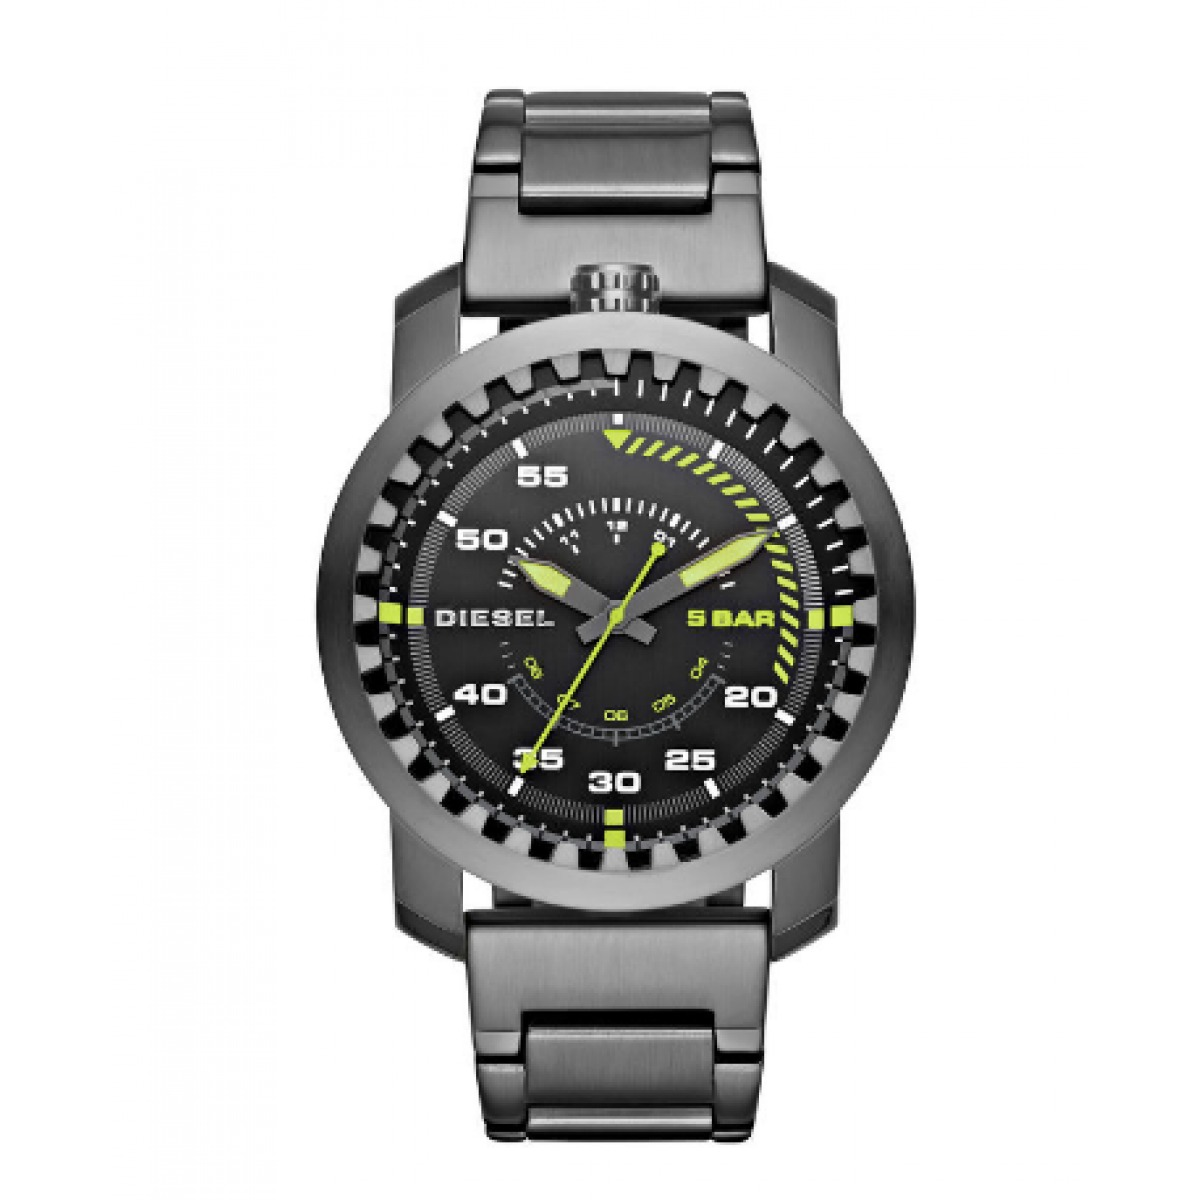 cc80147c405 relógio masculino diesel rig dz1751 ( rev.autorizado ) - nfe. Carregando  zoom.